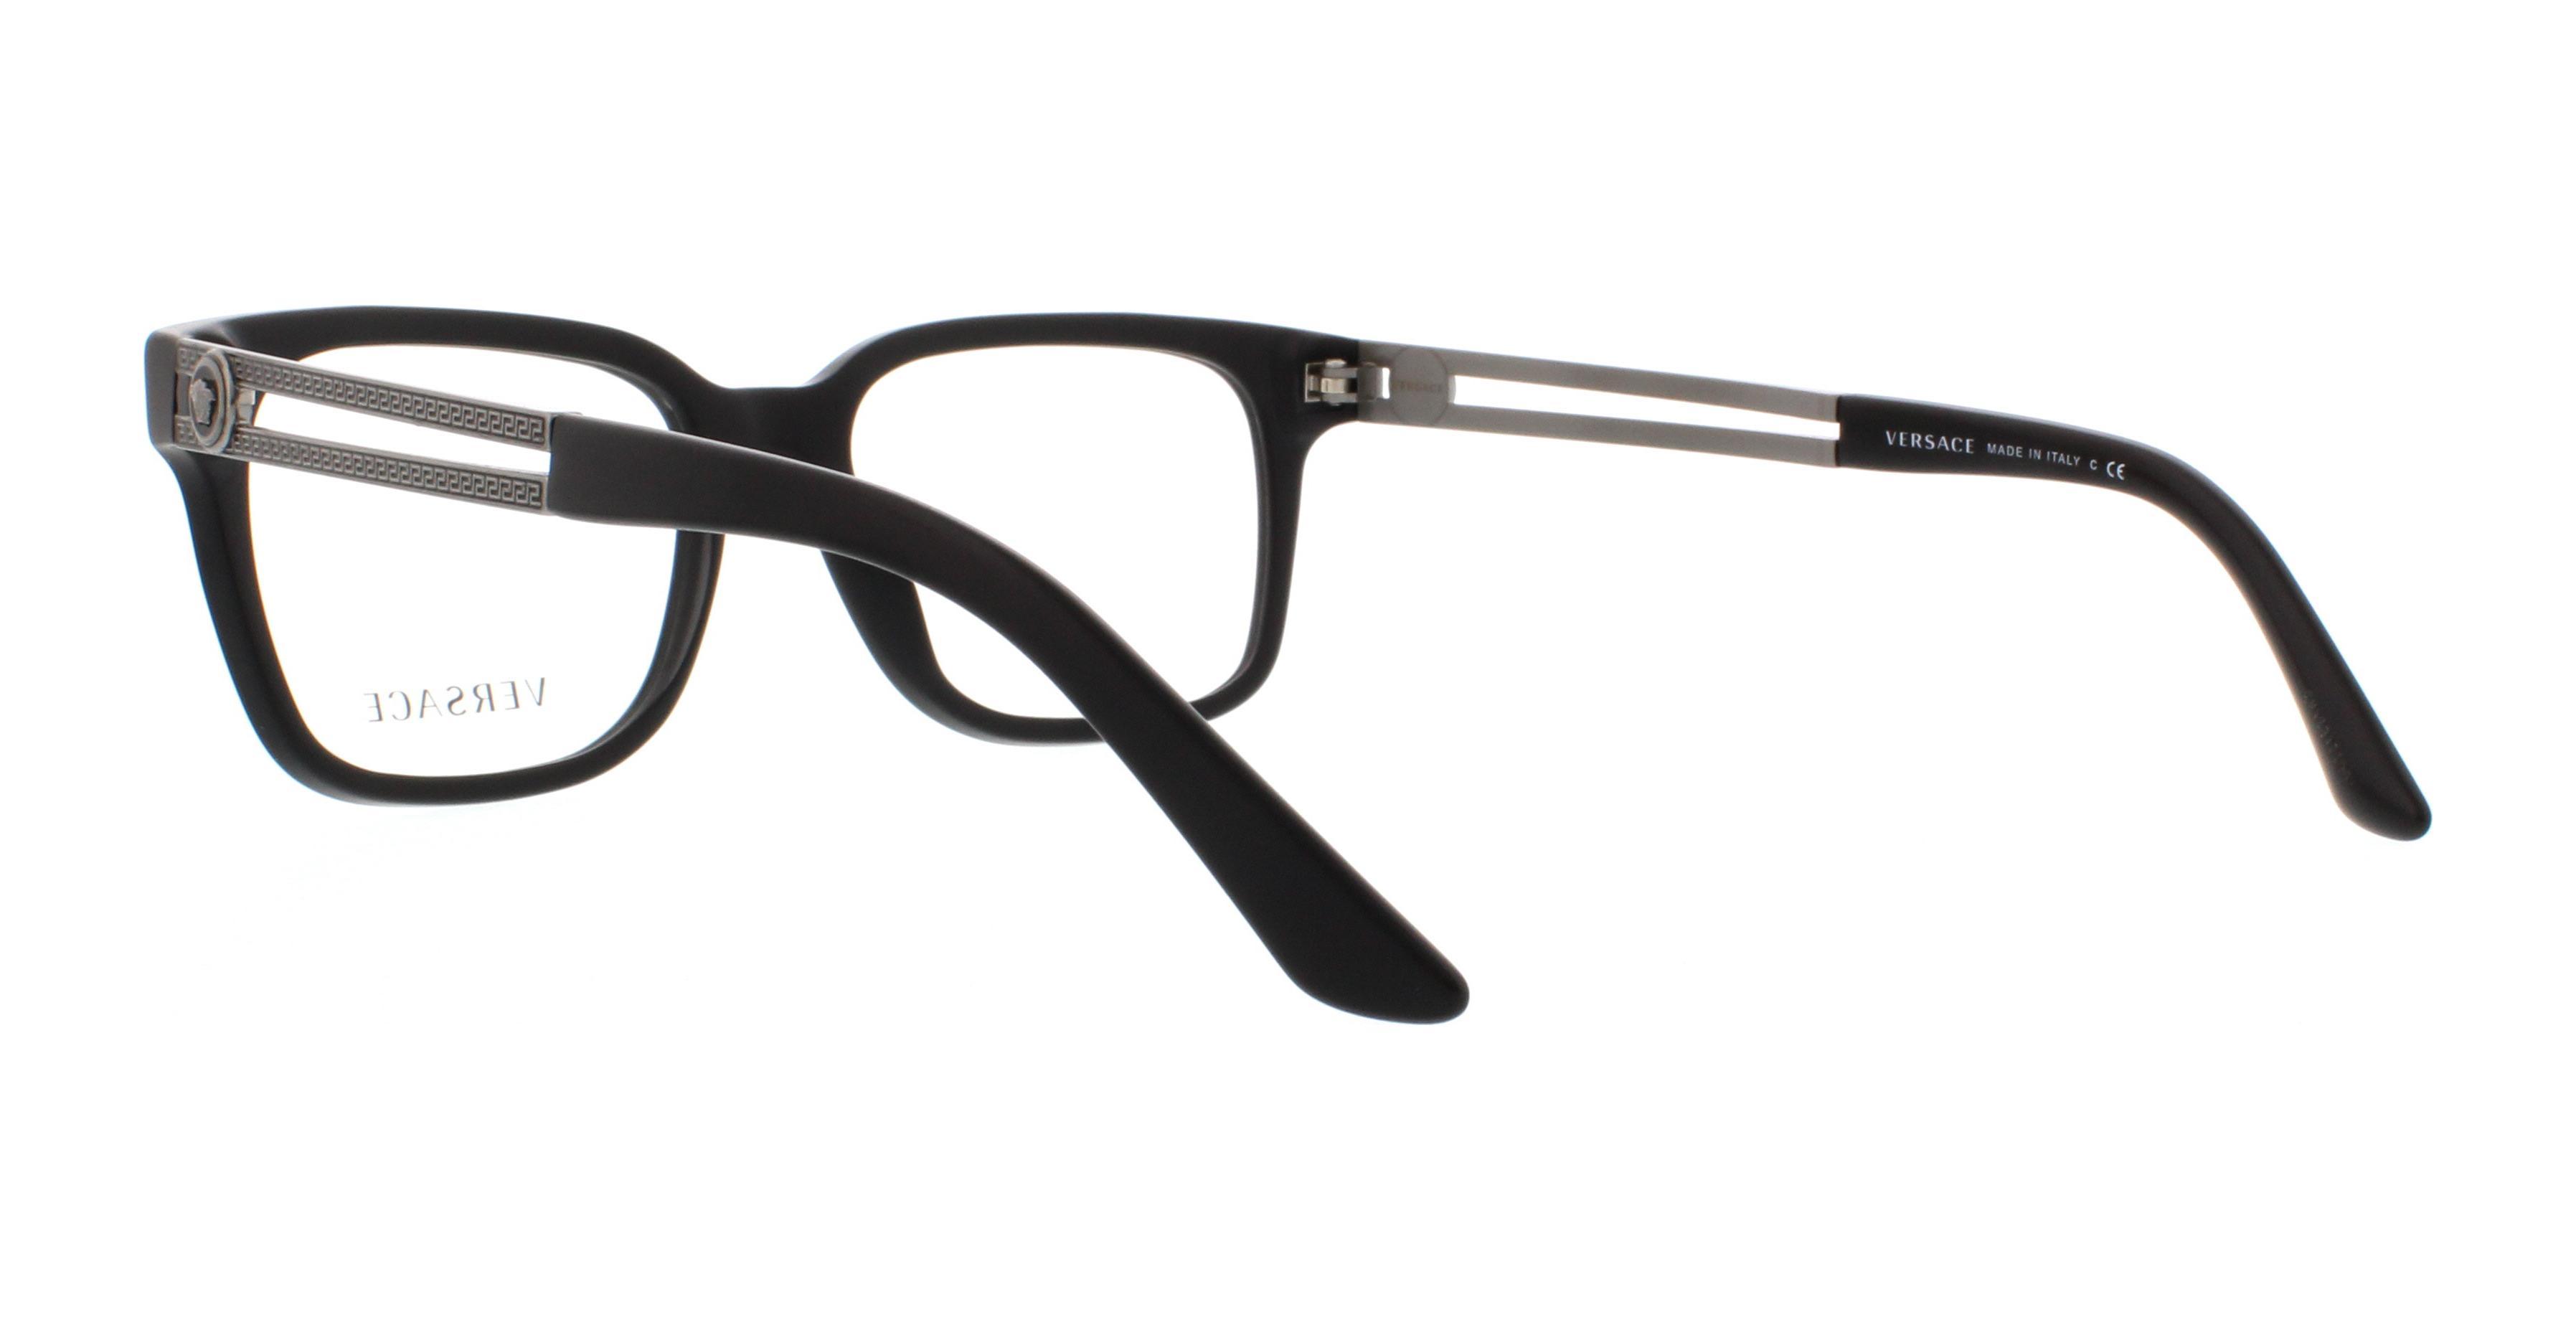 c625a238e1a Designer Frames Outlet. Versace VE3218